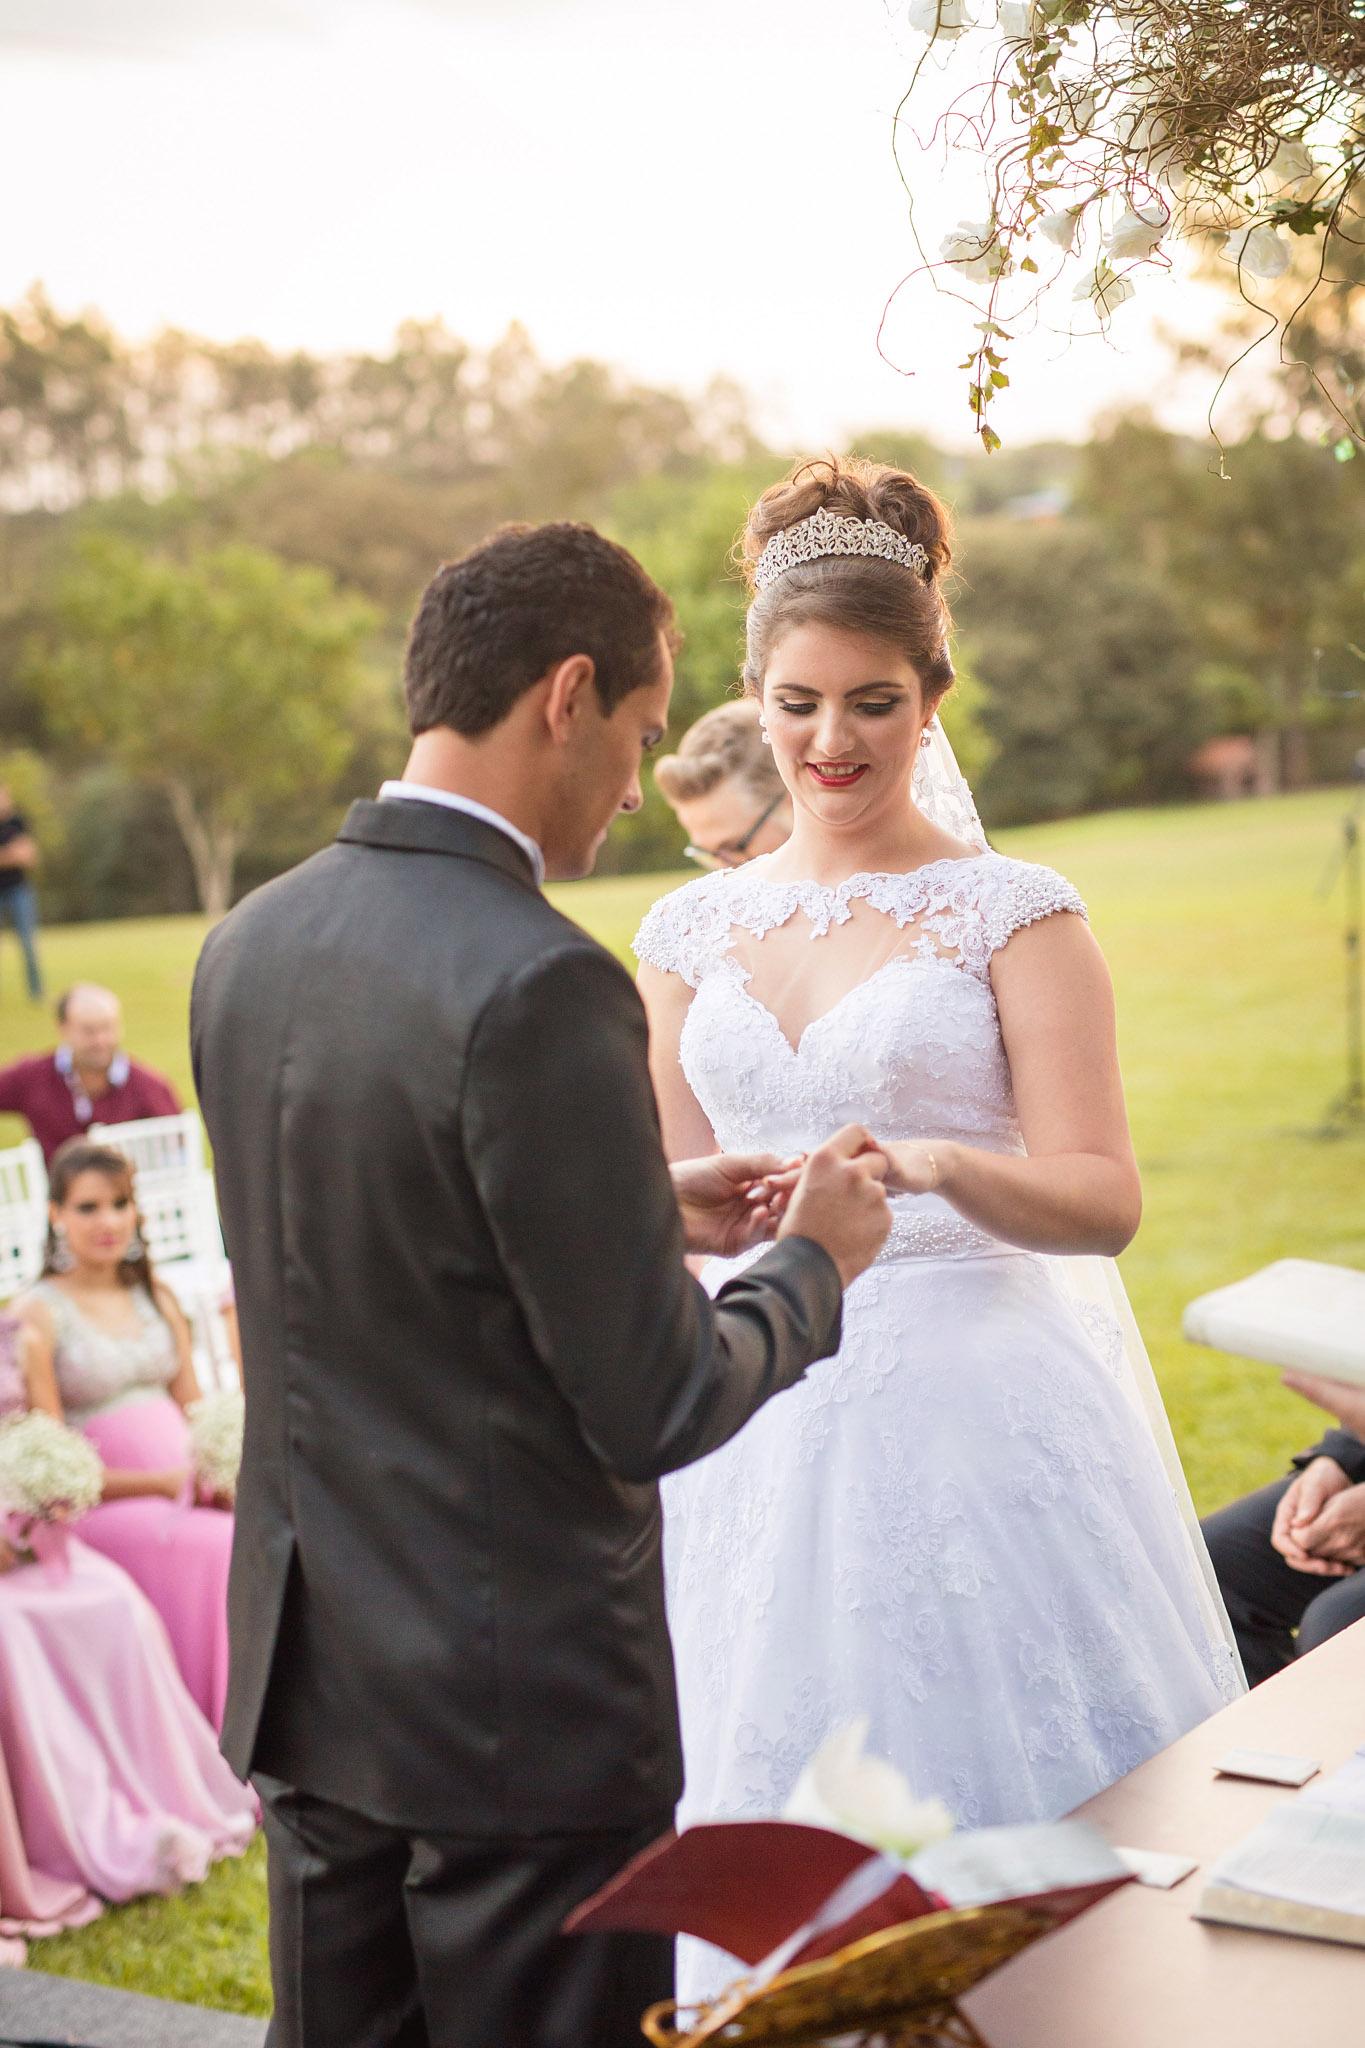 Wedding_Travellers_Destination_Wedding_Photography-121.jpg